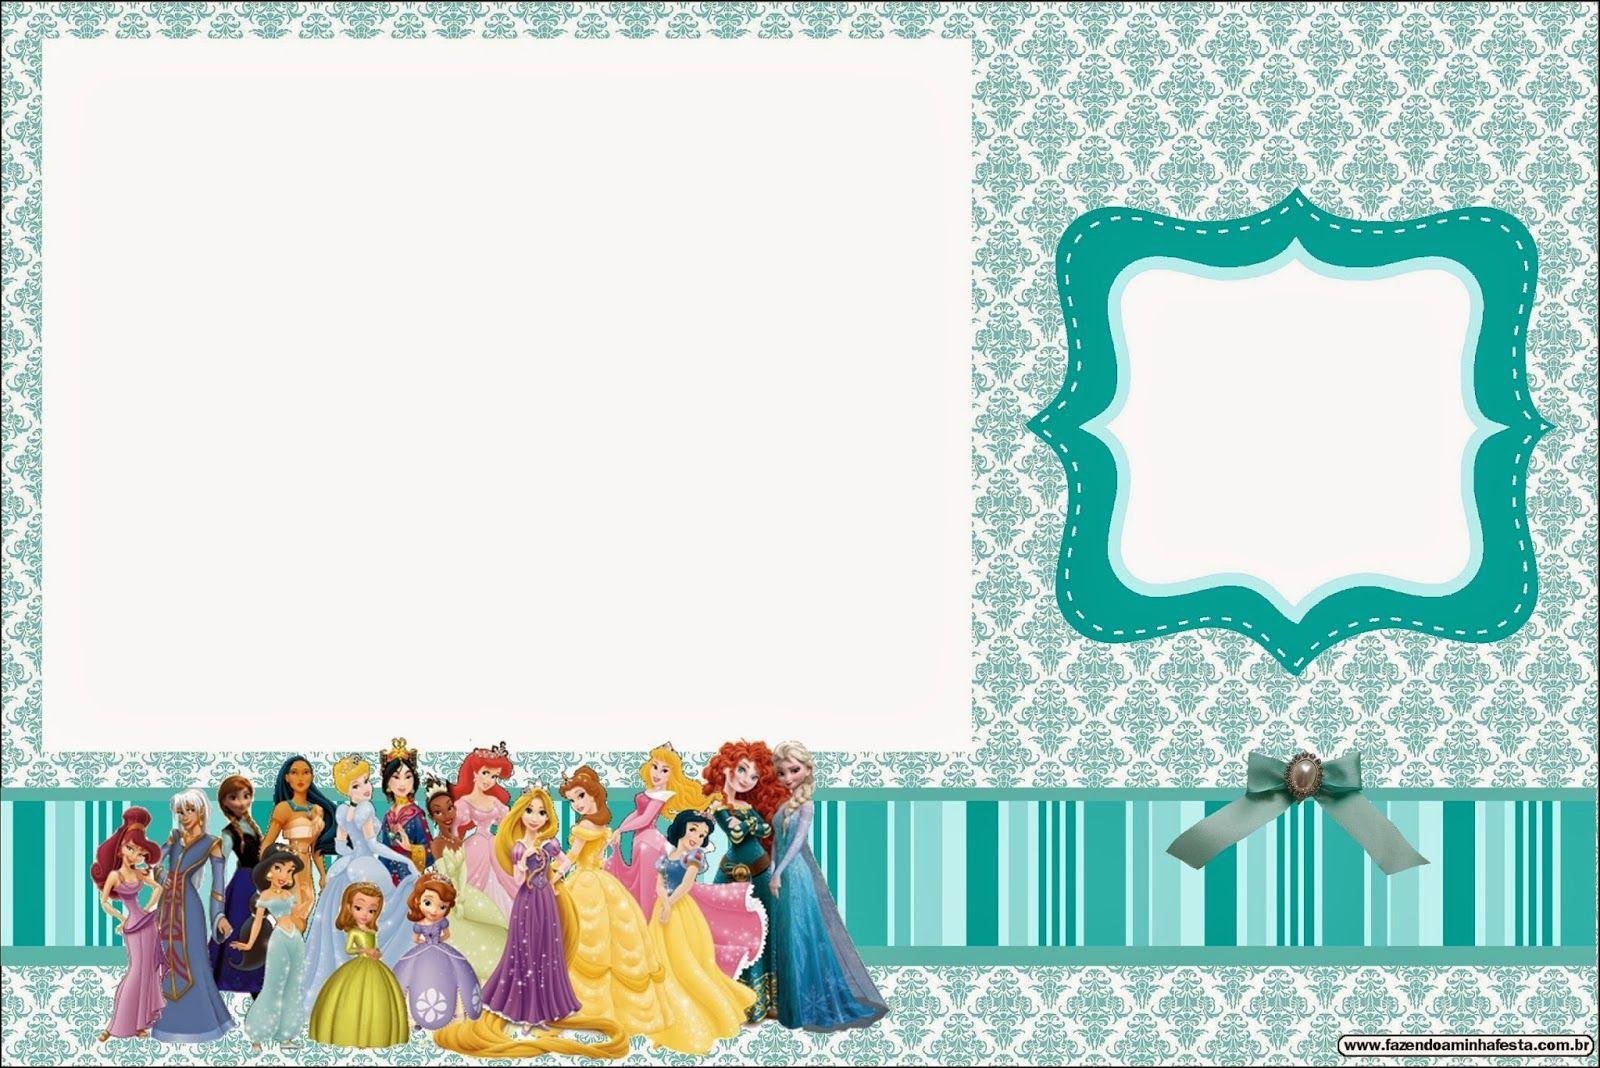 Disney Princess Invitation Templates Free Luxury All Disney Princess Free Printable Invitations